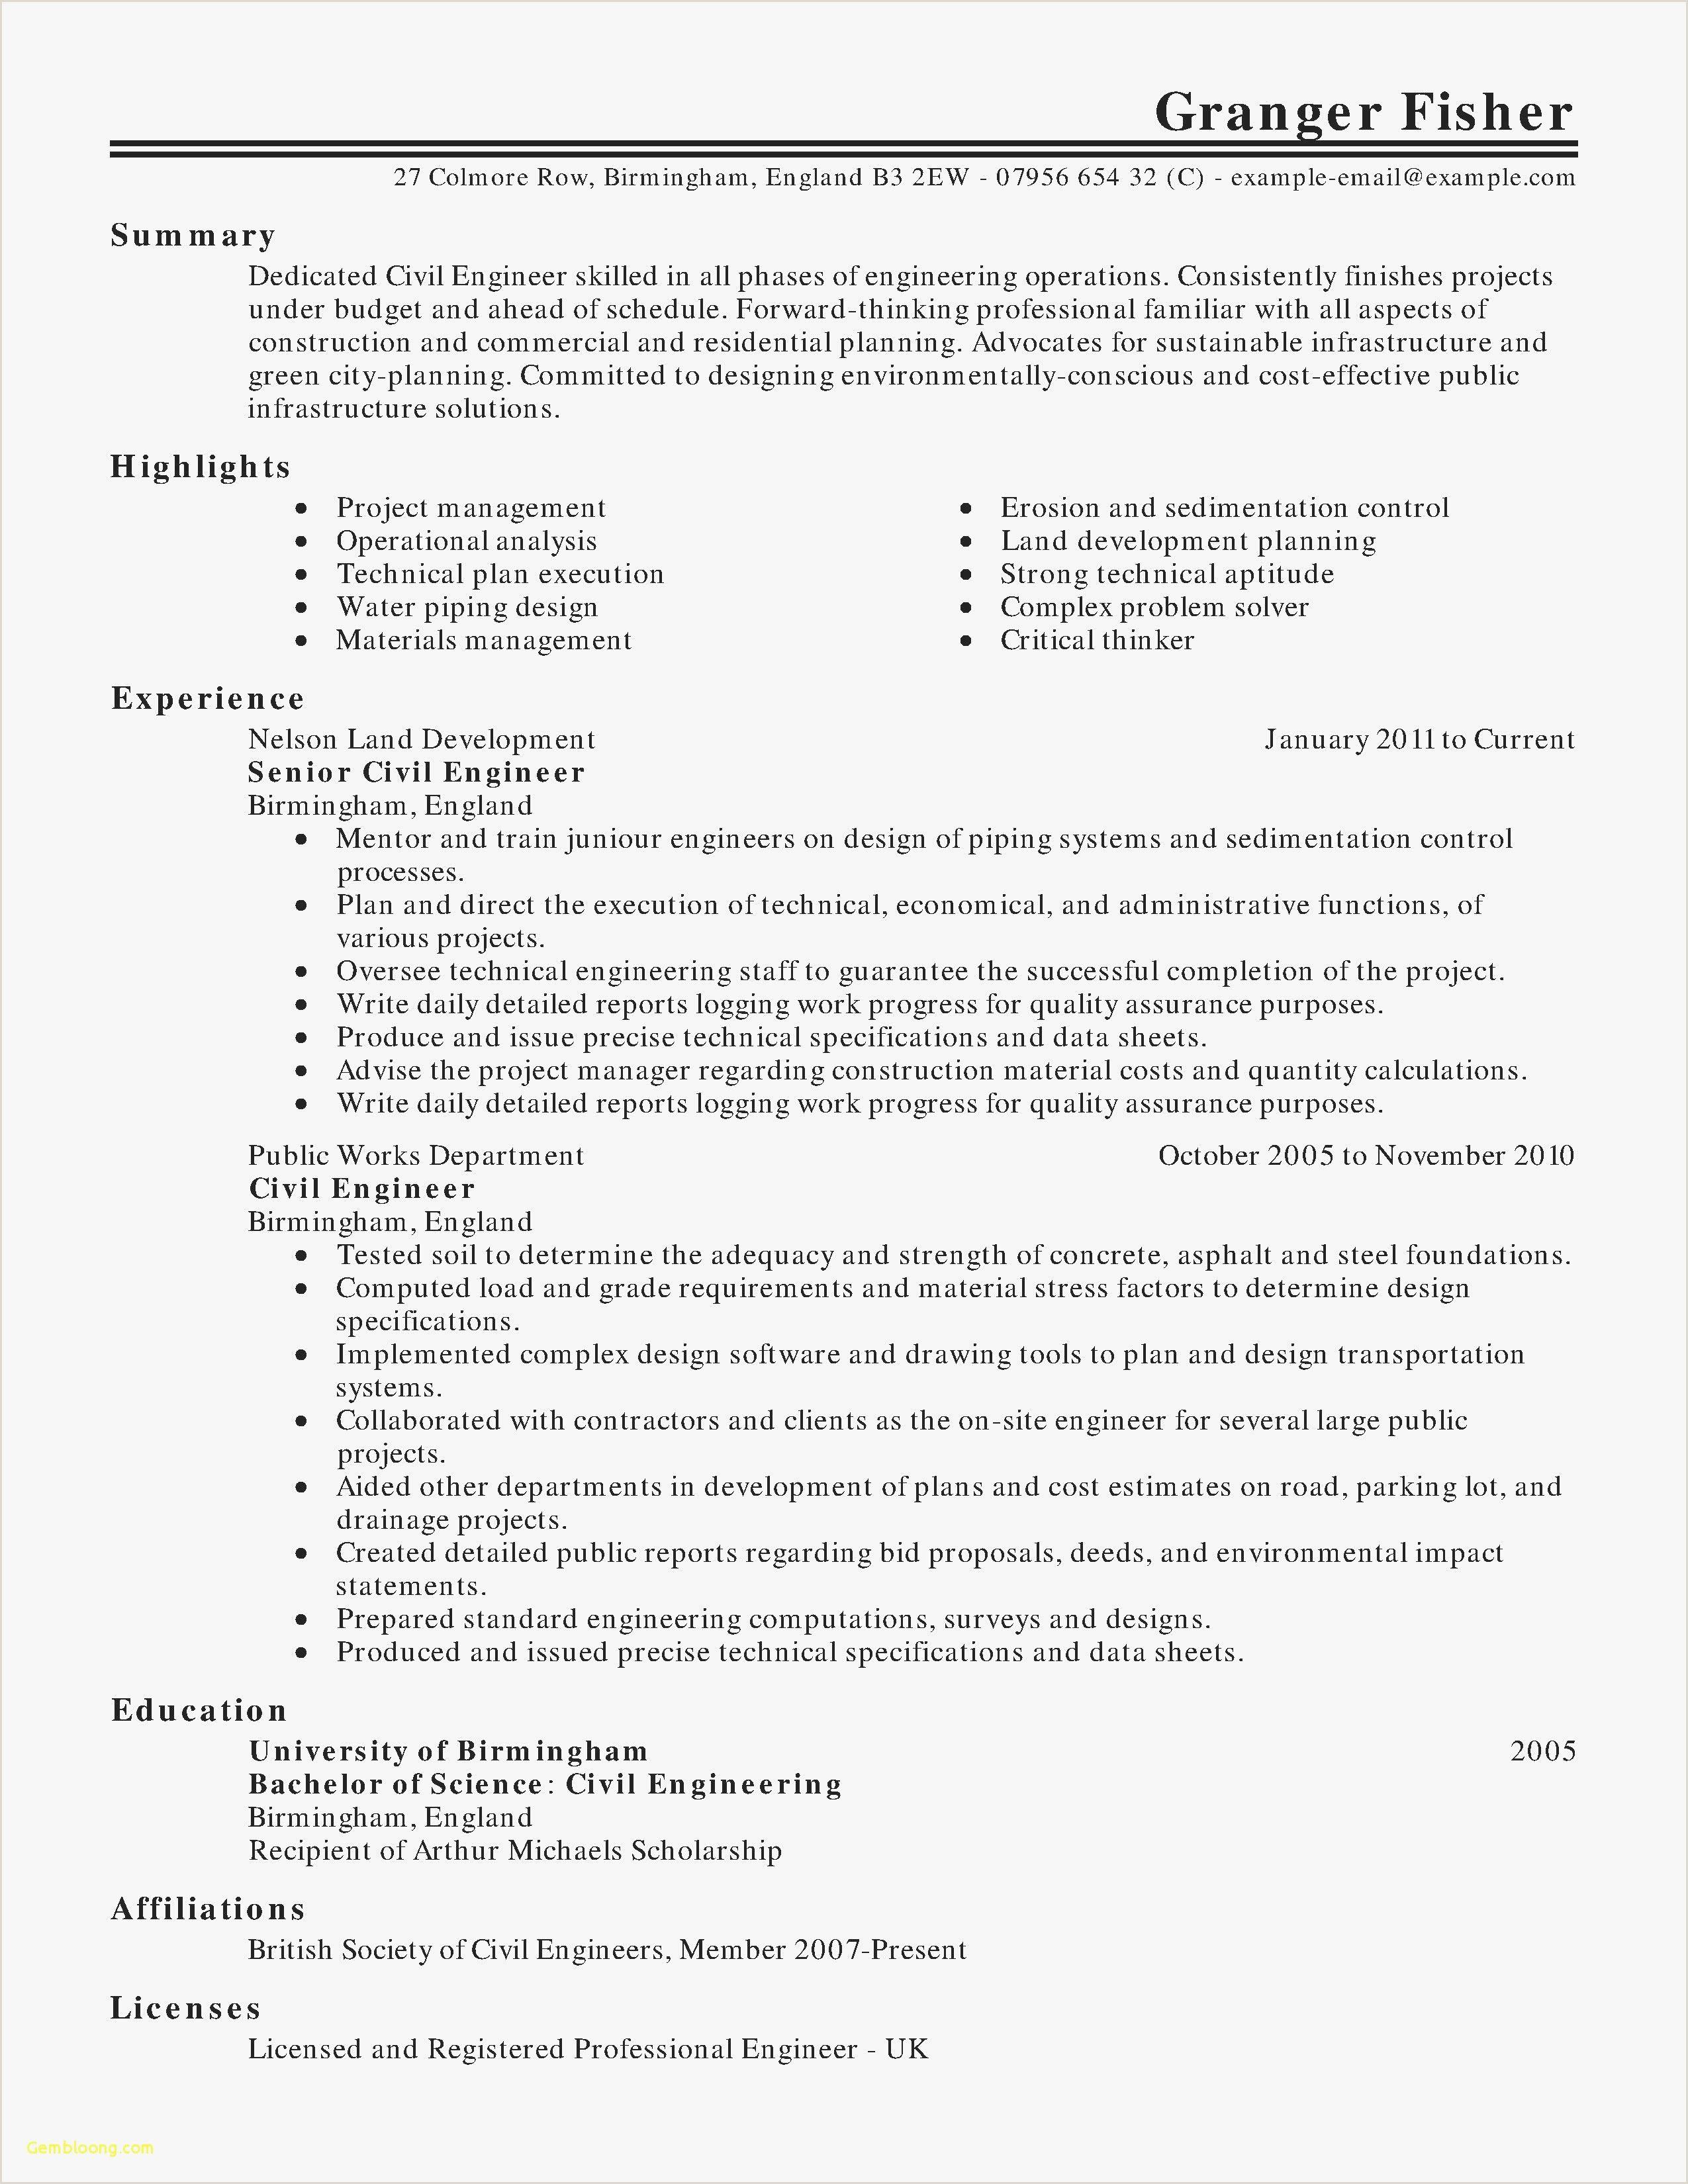 Format Of Professional Cv Pdf in 2020 Resume summary